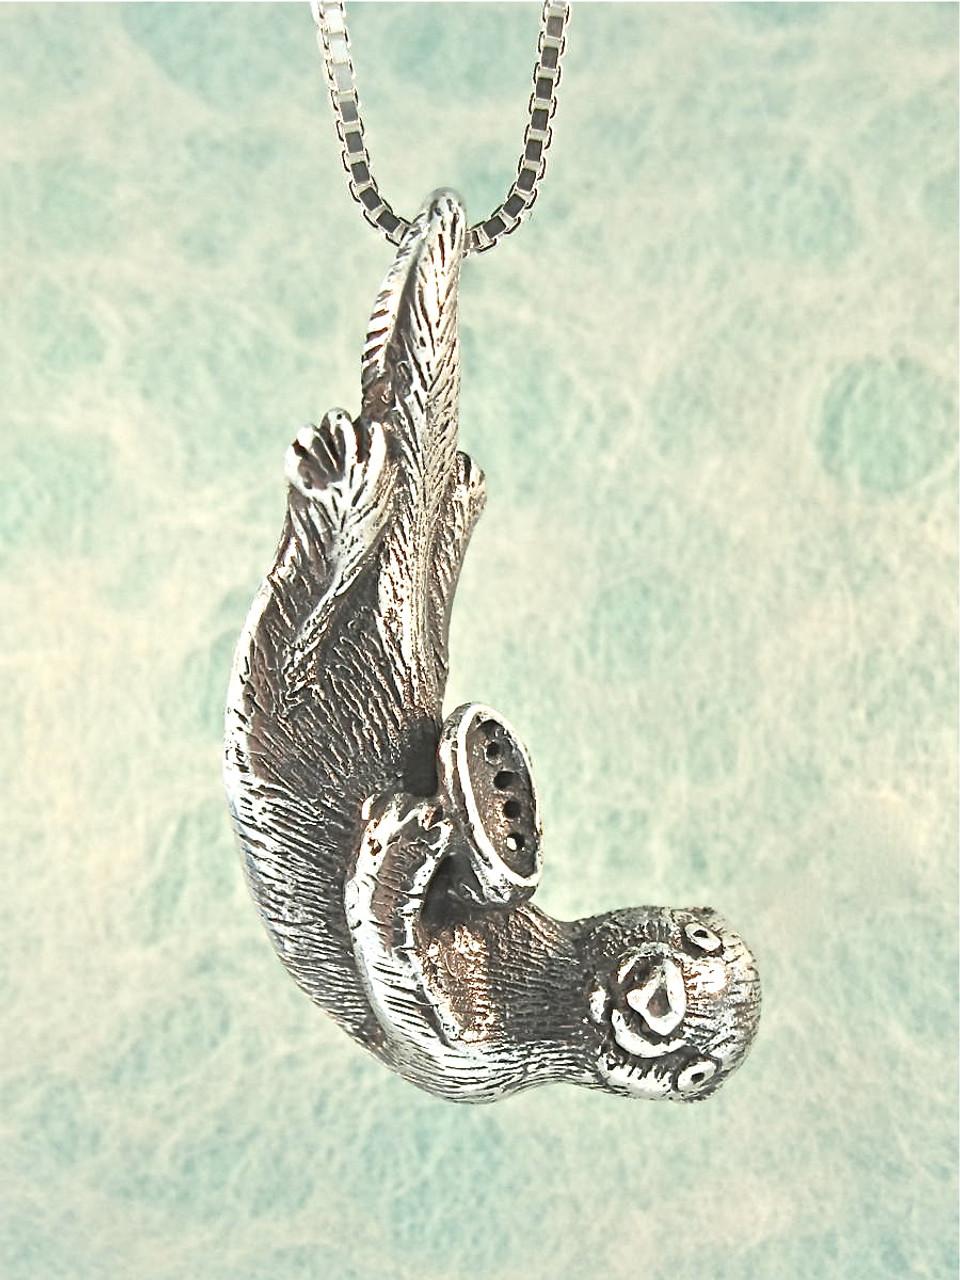 Sea life sea otter pendant jewelry sea life sea otter pendant silver aloadofball Image collections